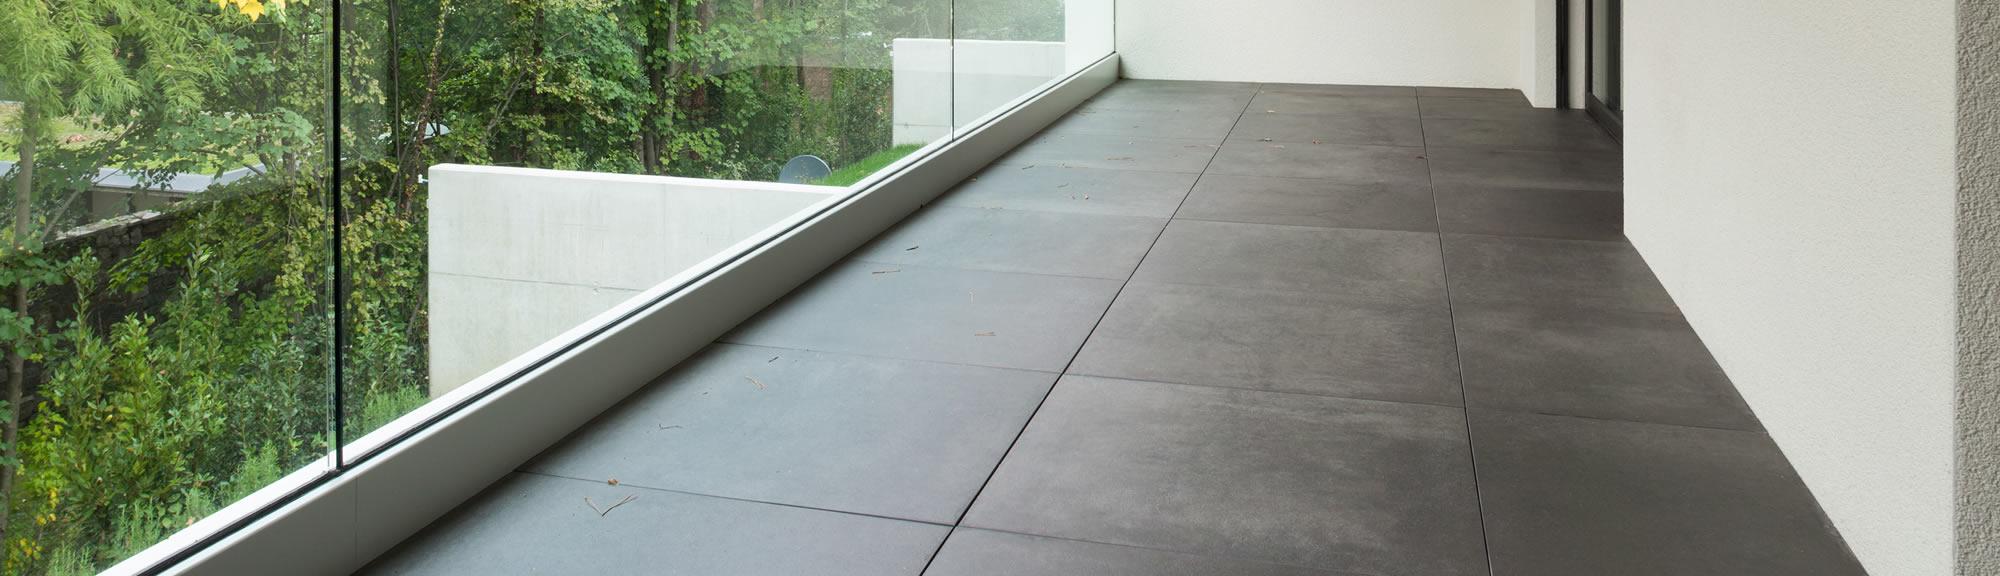 Gut gemocht Balkon- & Terrassensanierung | Schorn GmbH, Golling bei Salzburg RL24